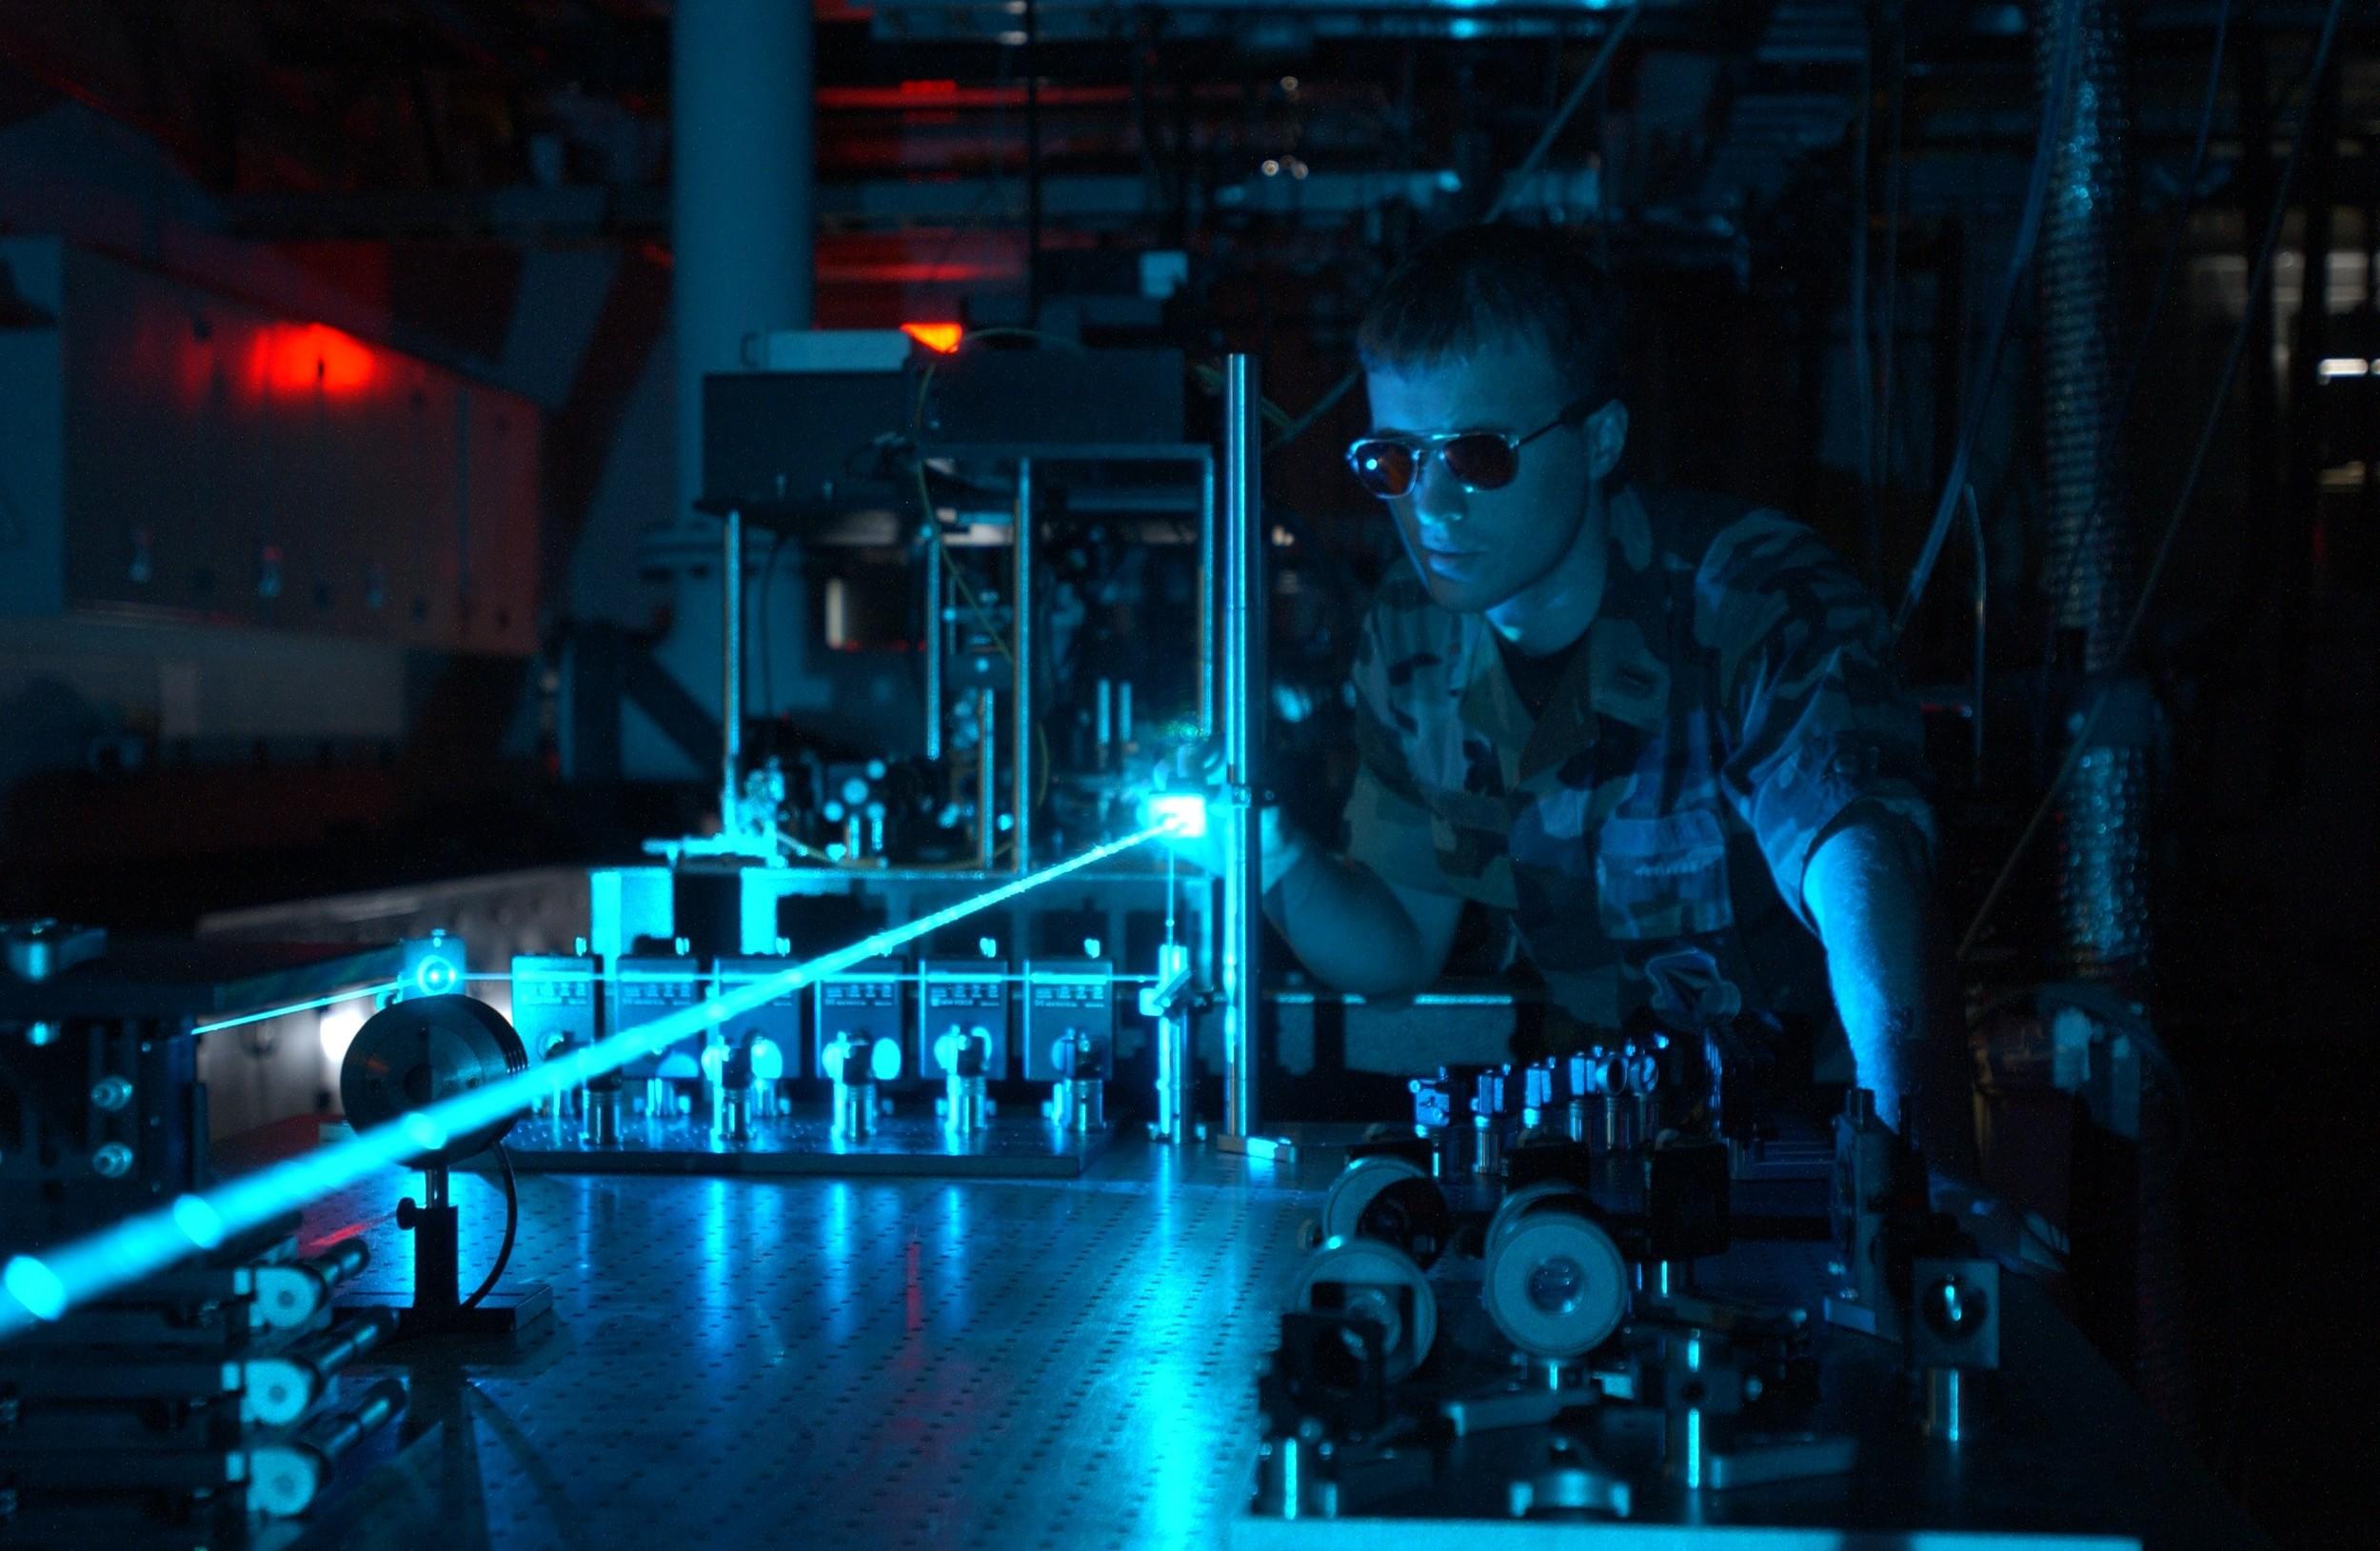 Military_laser_experiment.jpg